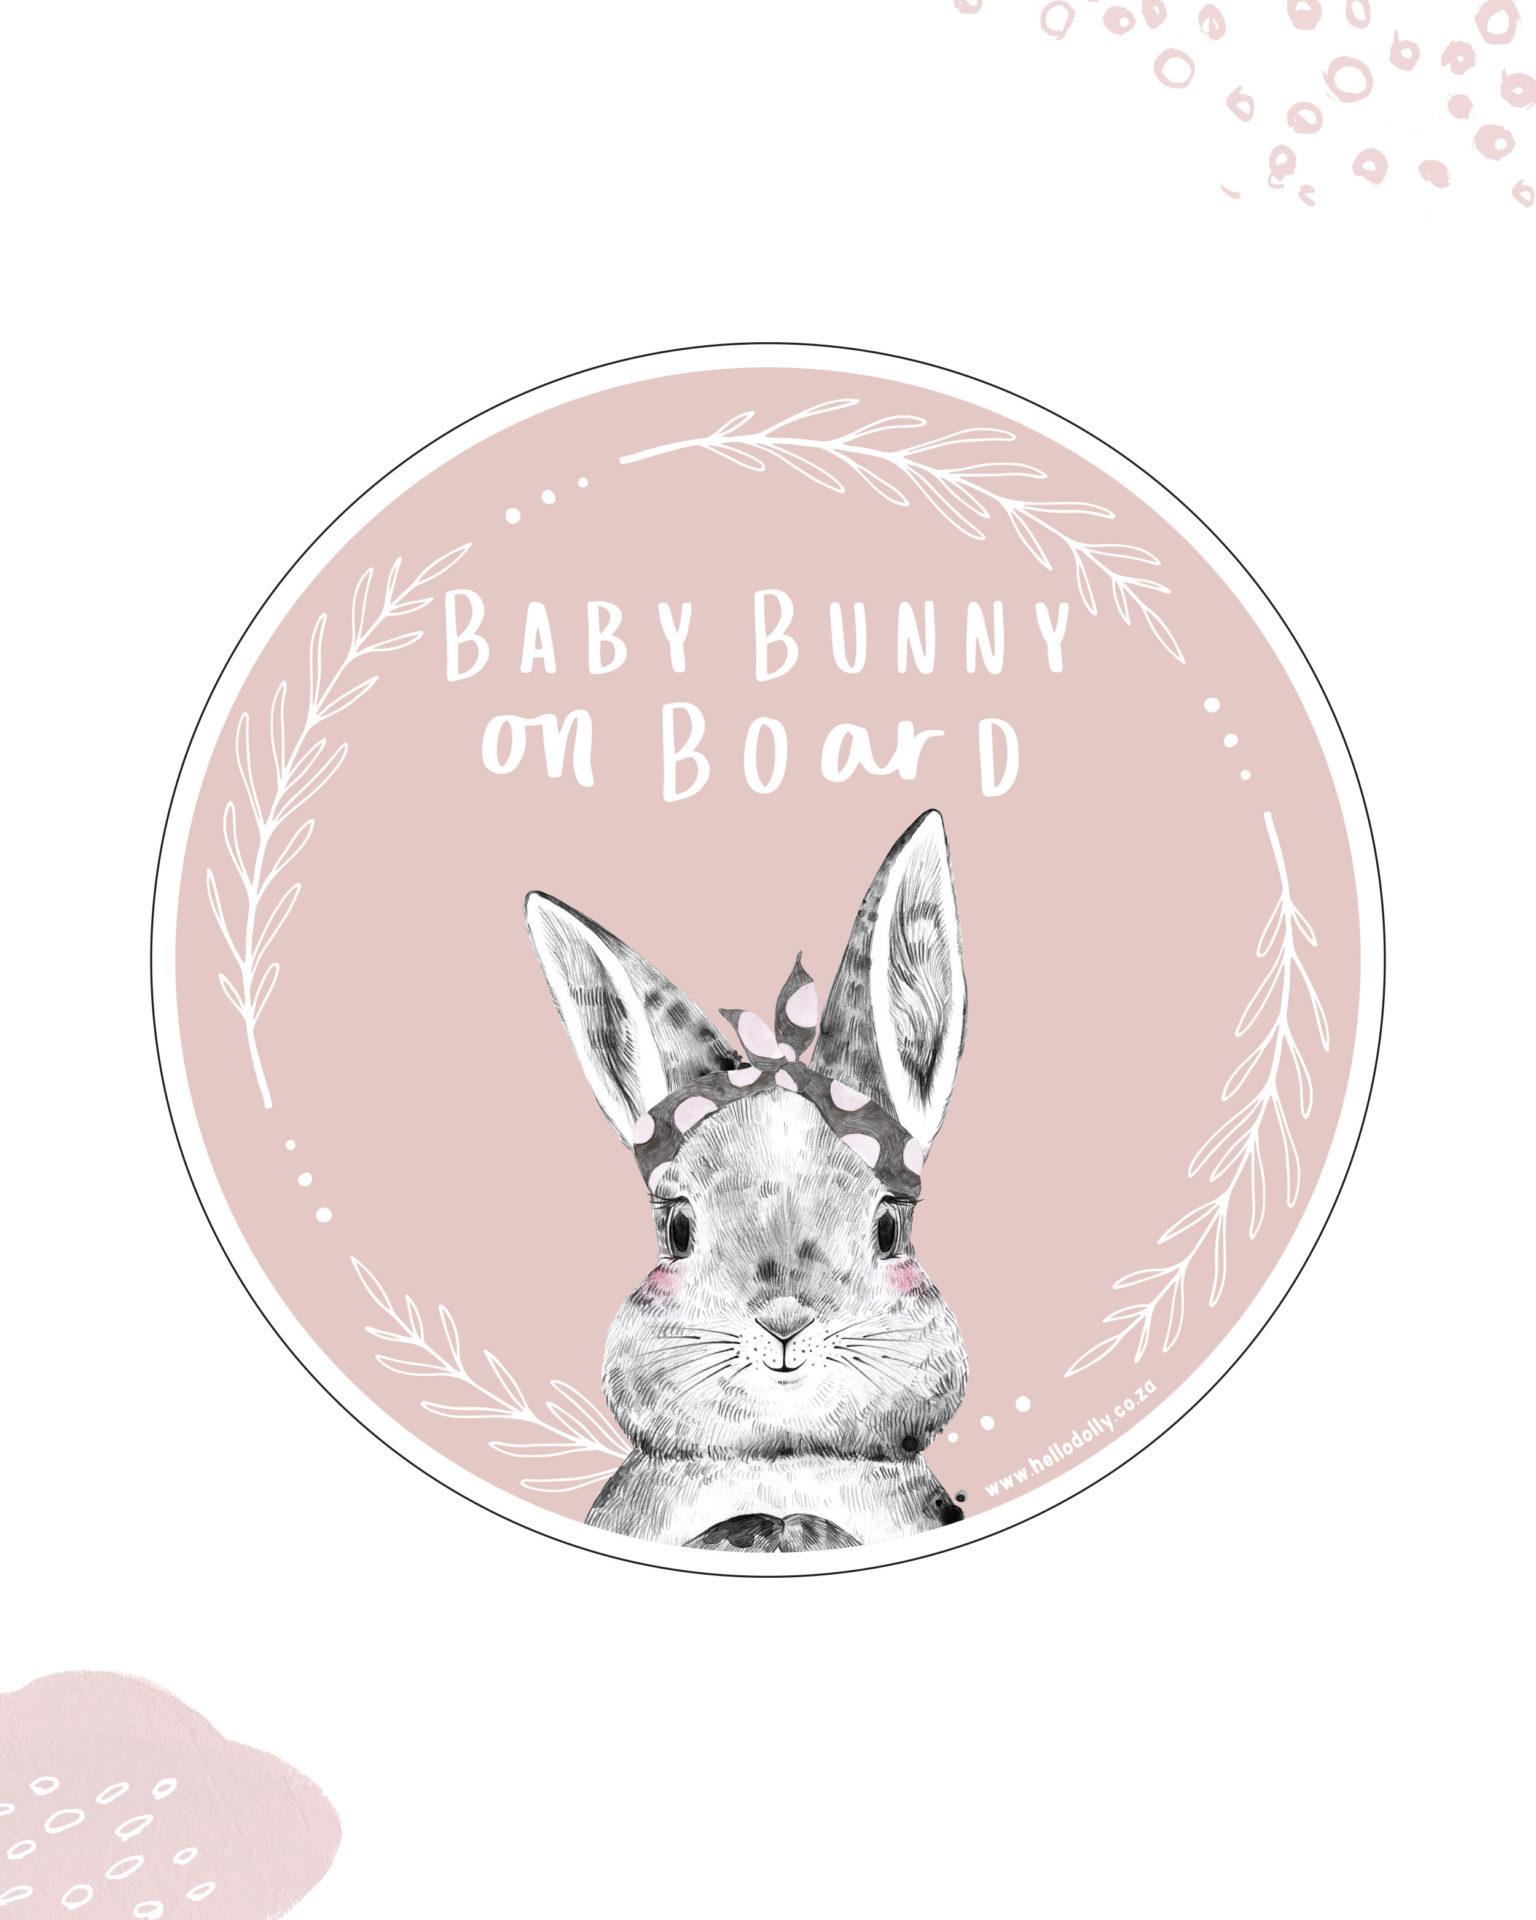 Baby Bunny on Board Sticker